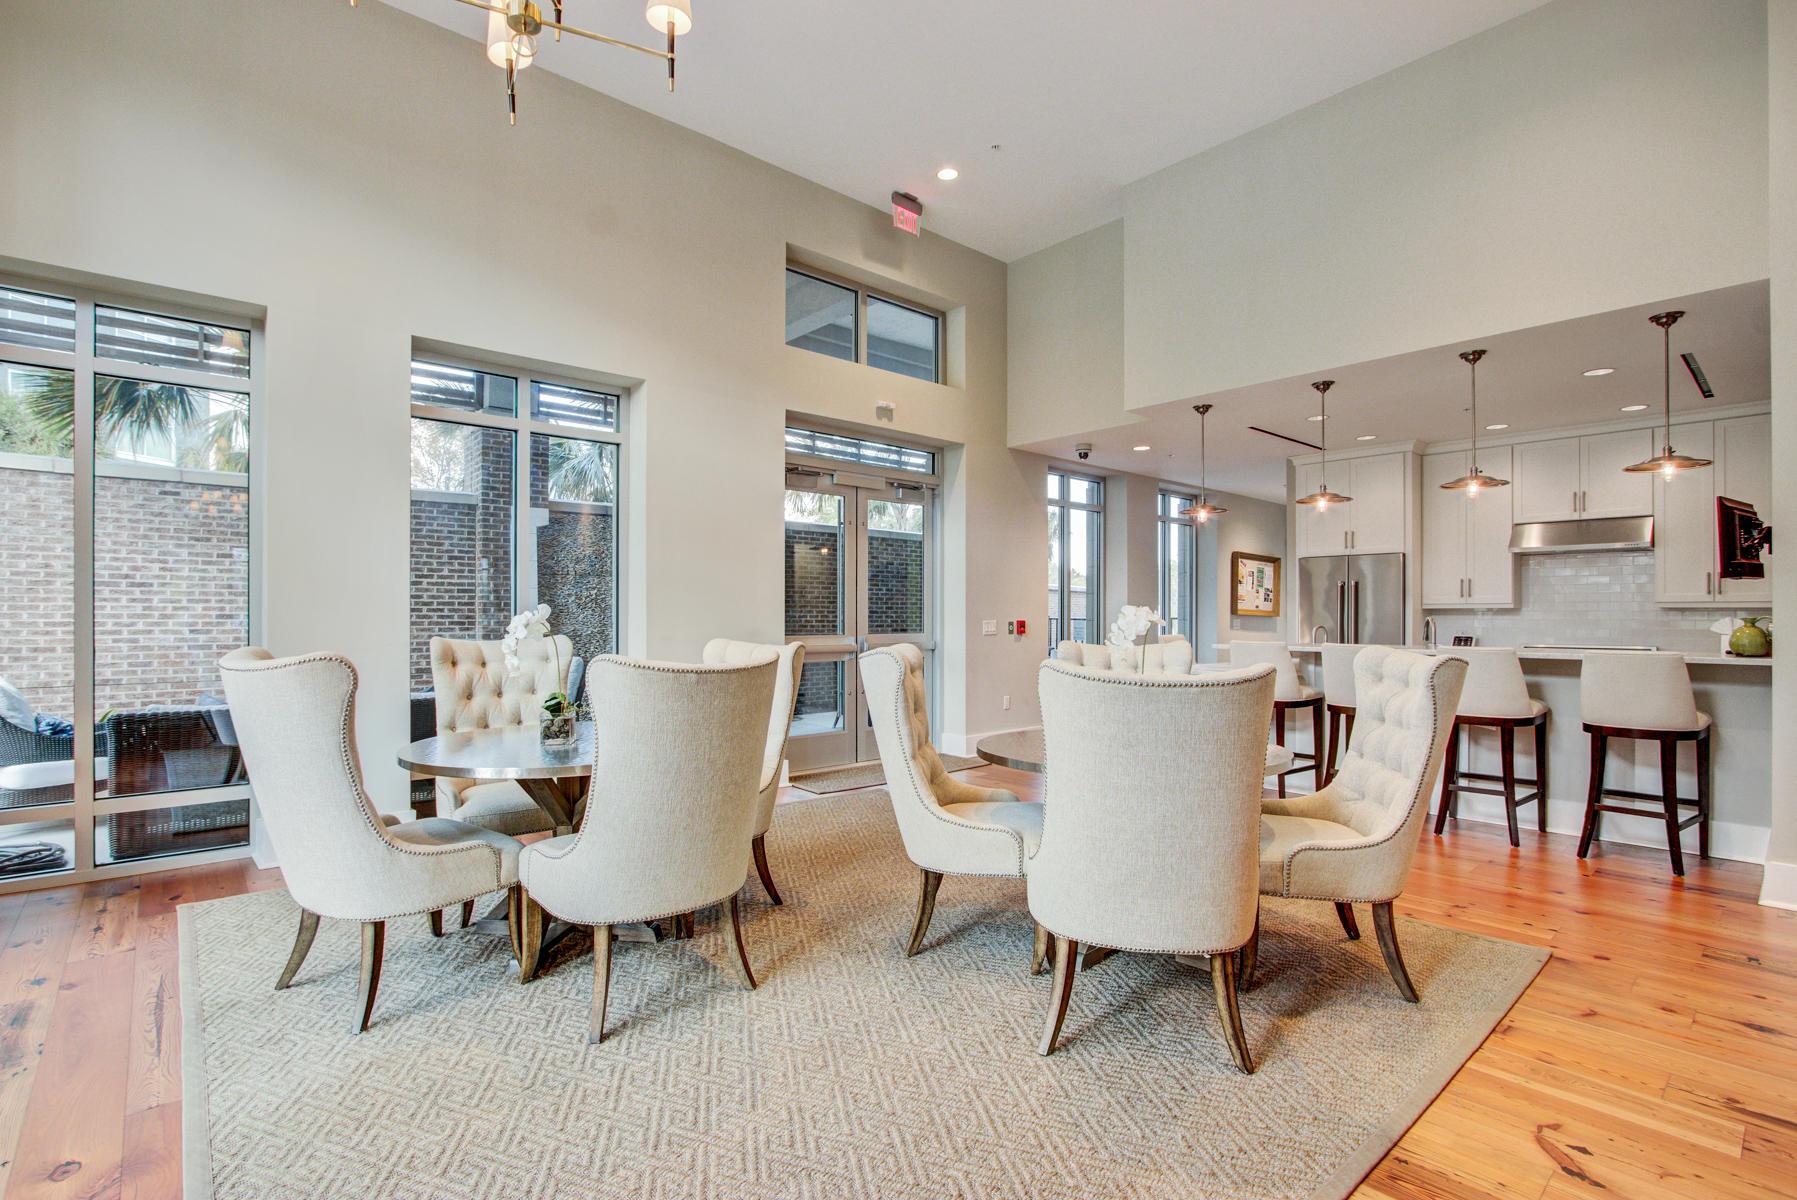 Tides IV Condominiums Homes For Sale - 155 Wingo, Mount Pleasant, SC - 9